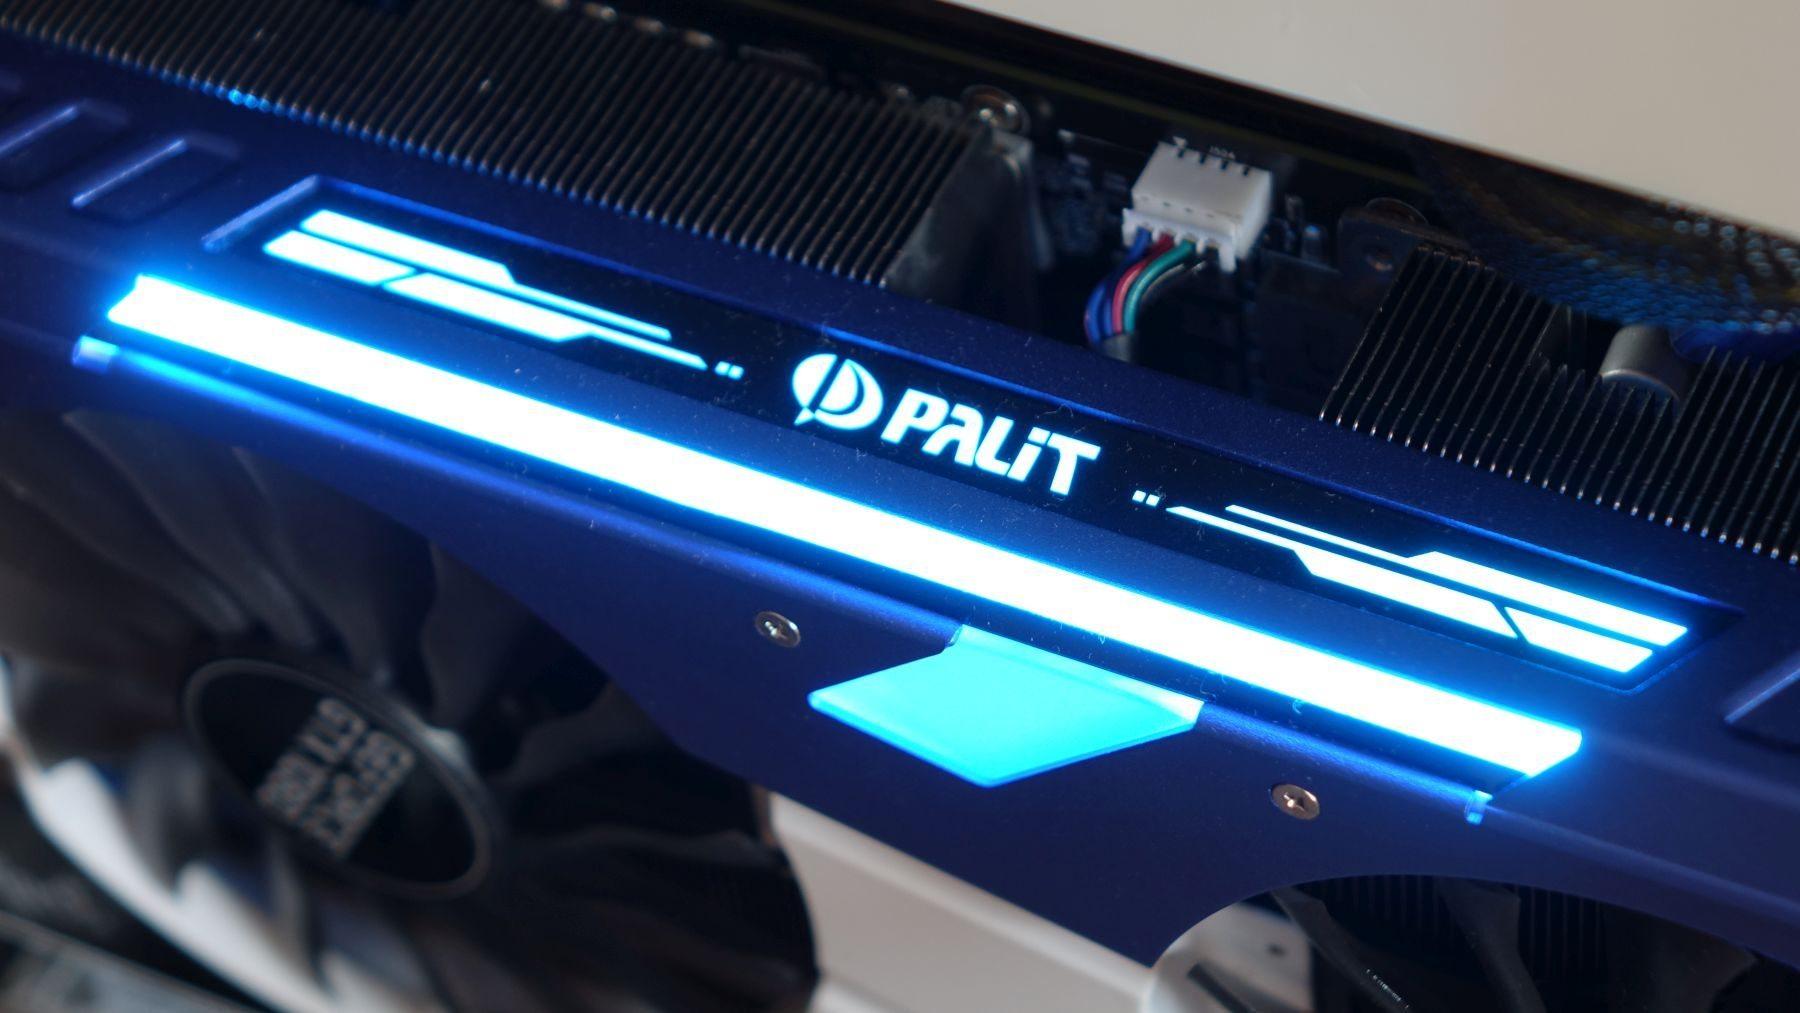 Palit GeForce GTX 1080 GameRock rgb